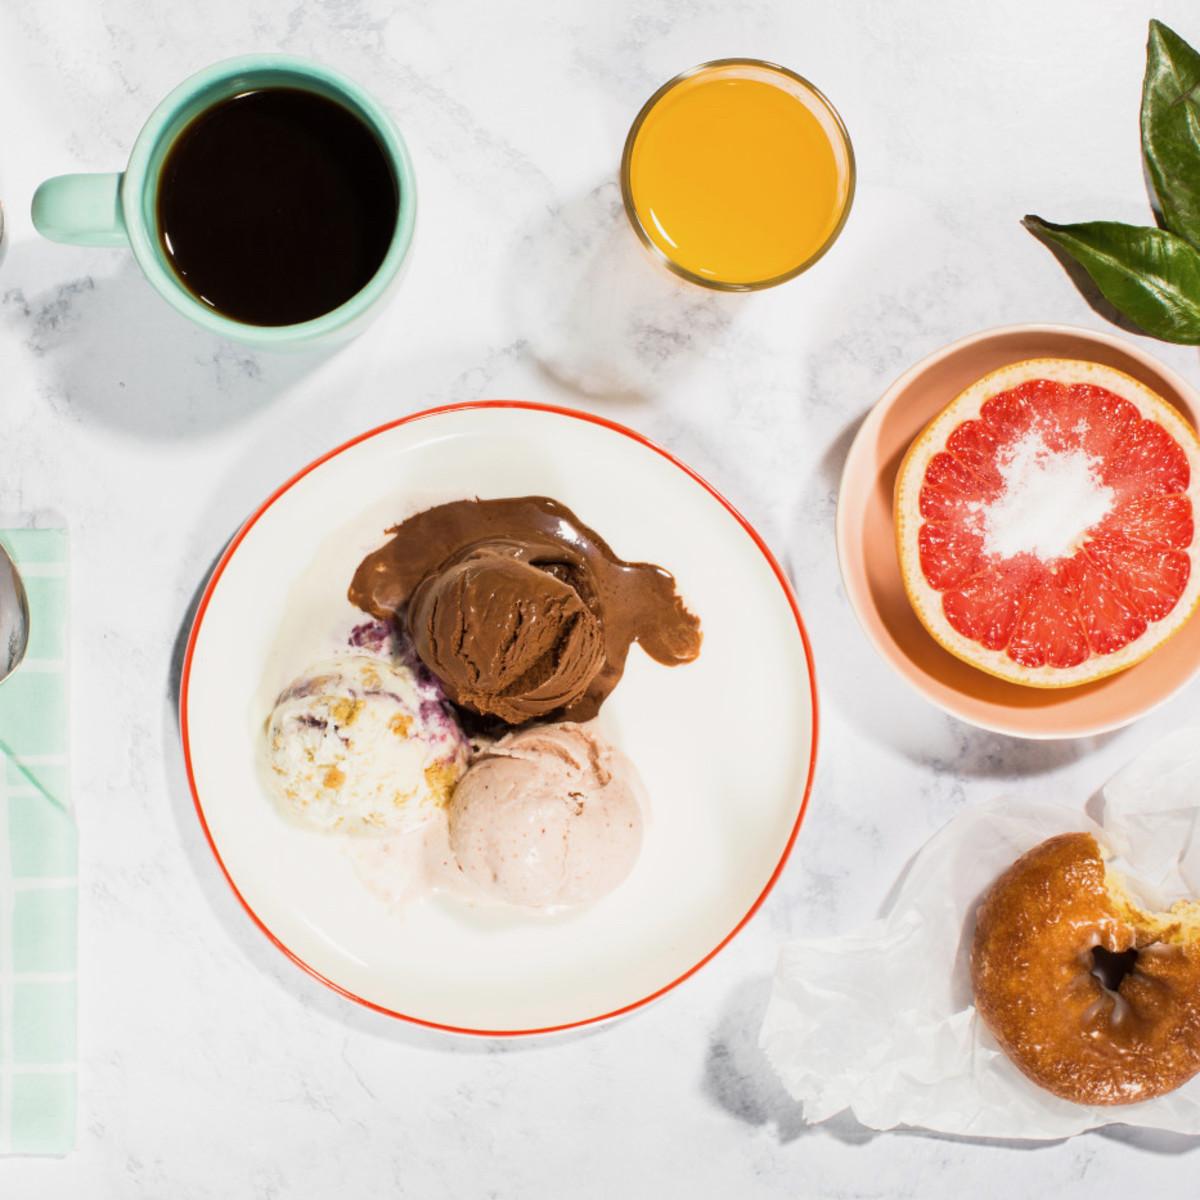 Jeni's Splendid Ice Creams breakfast